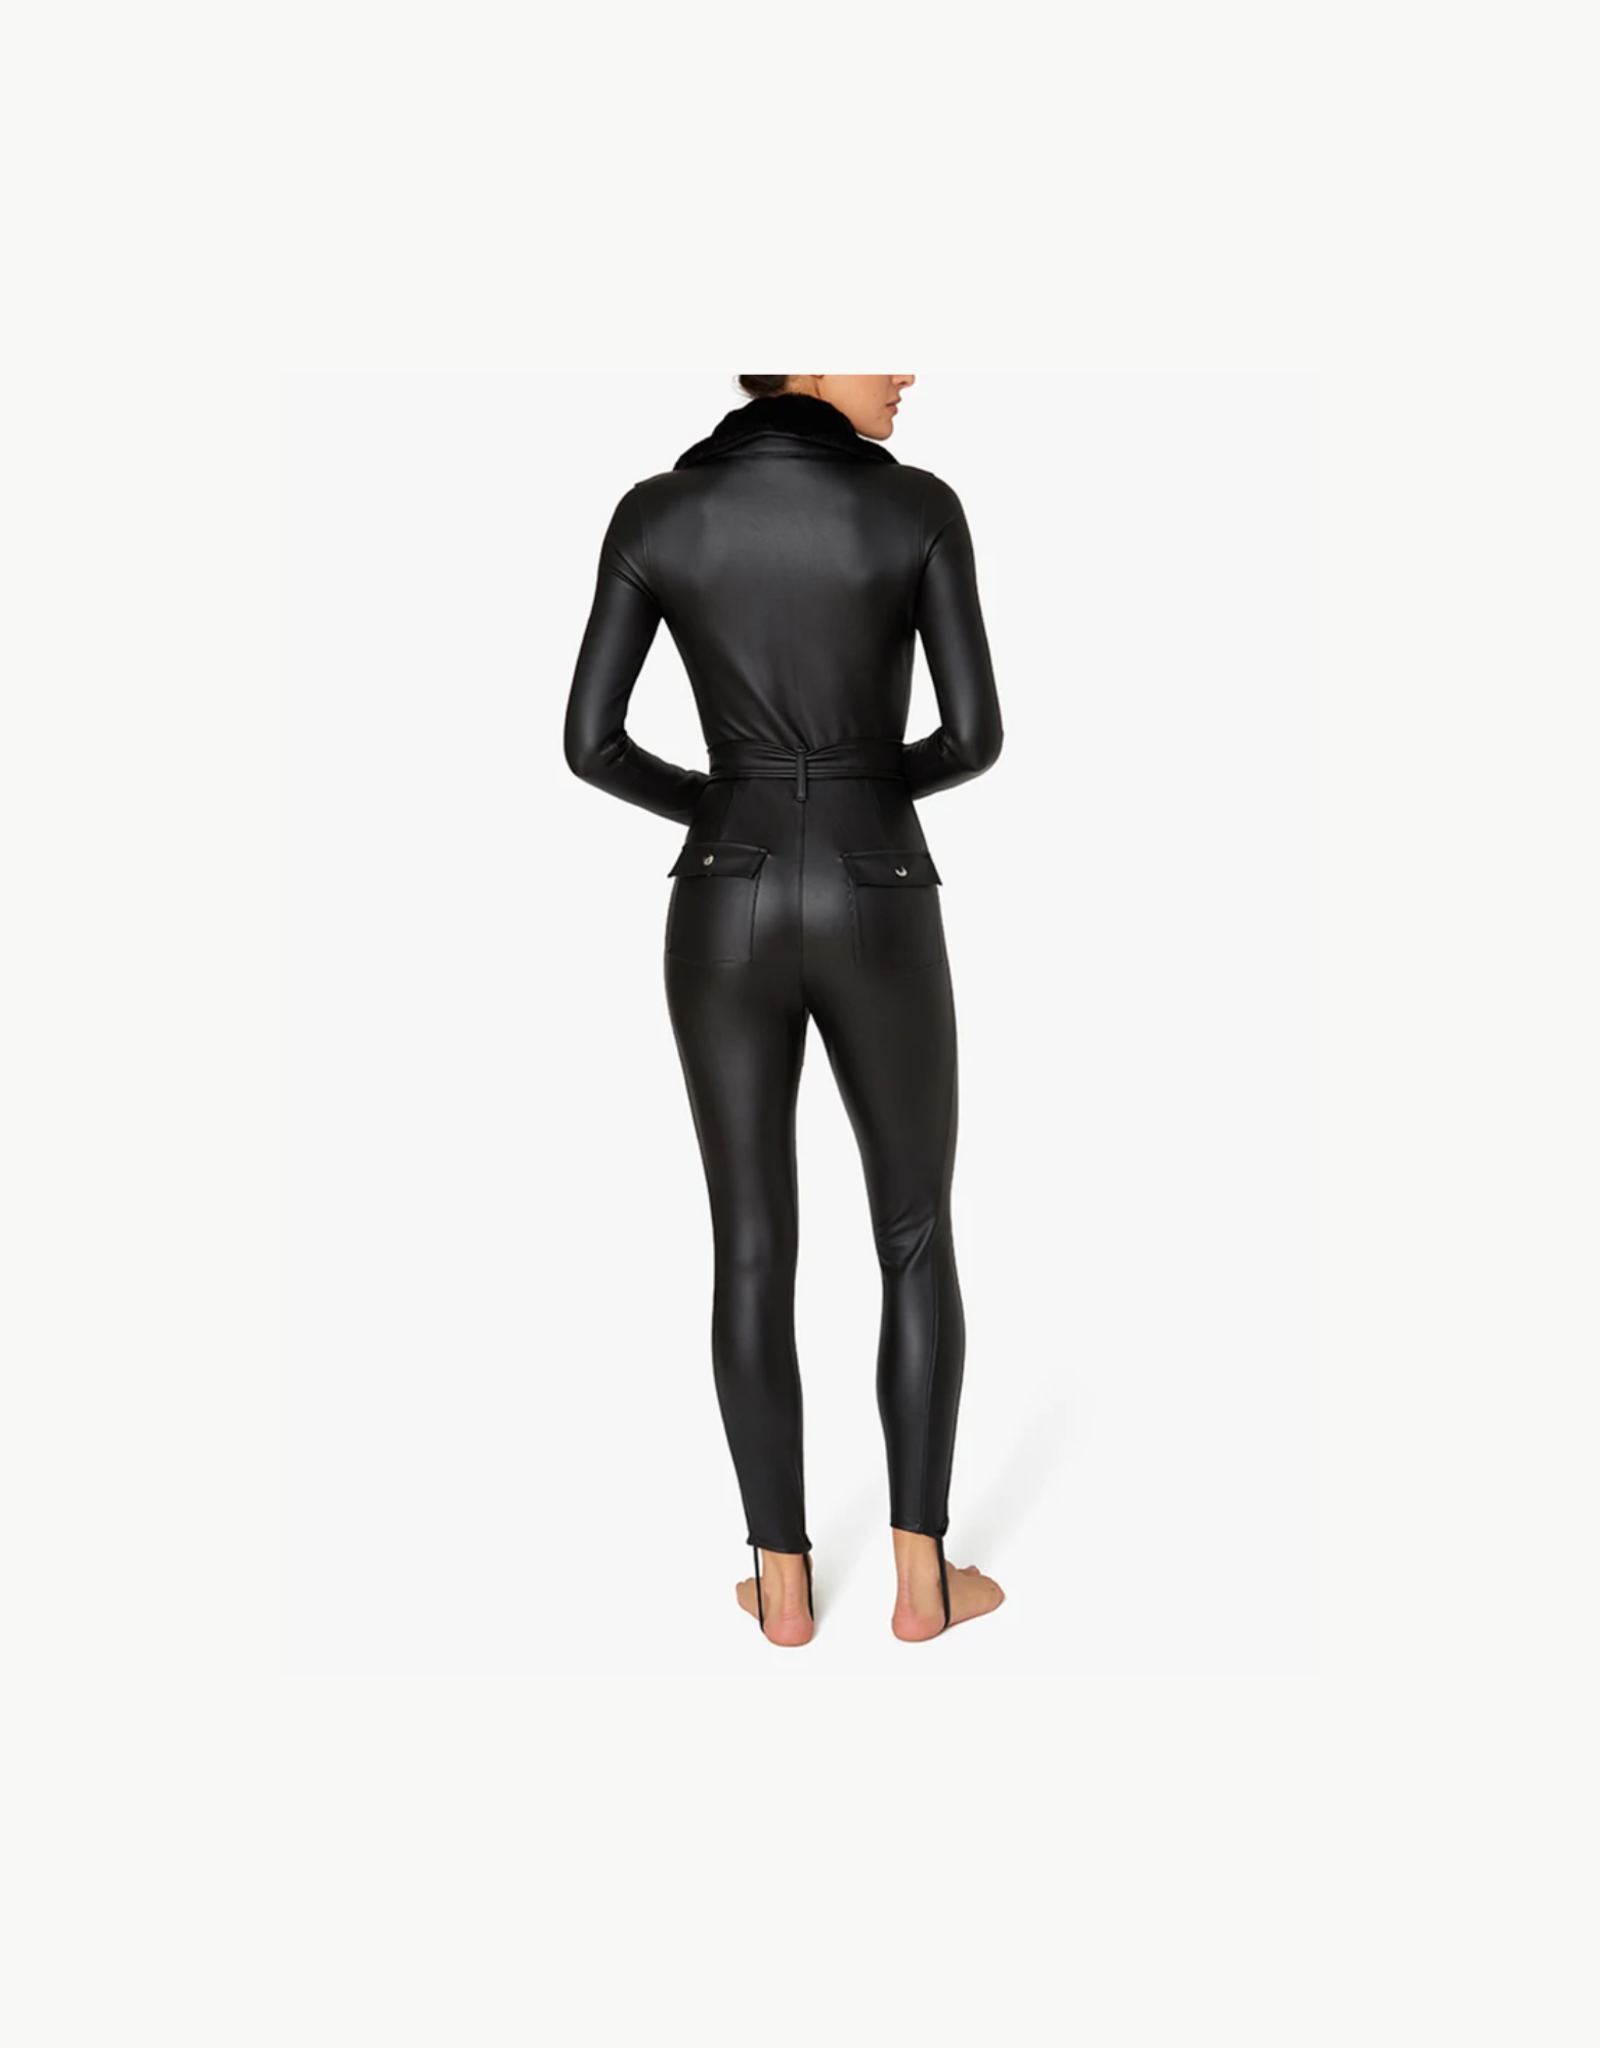 Shop WeWoreWhat Ski Suit with Fur Collar - Black